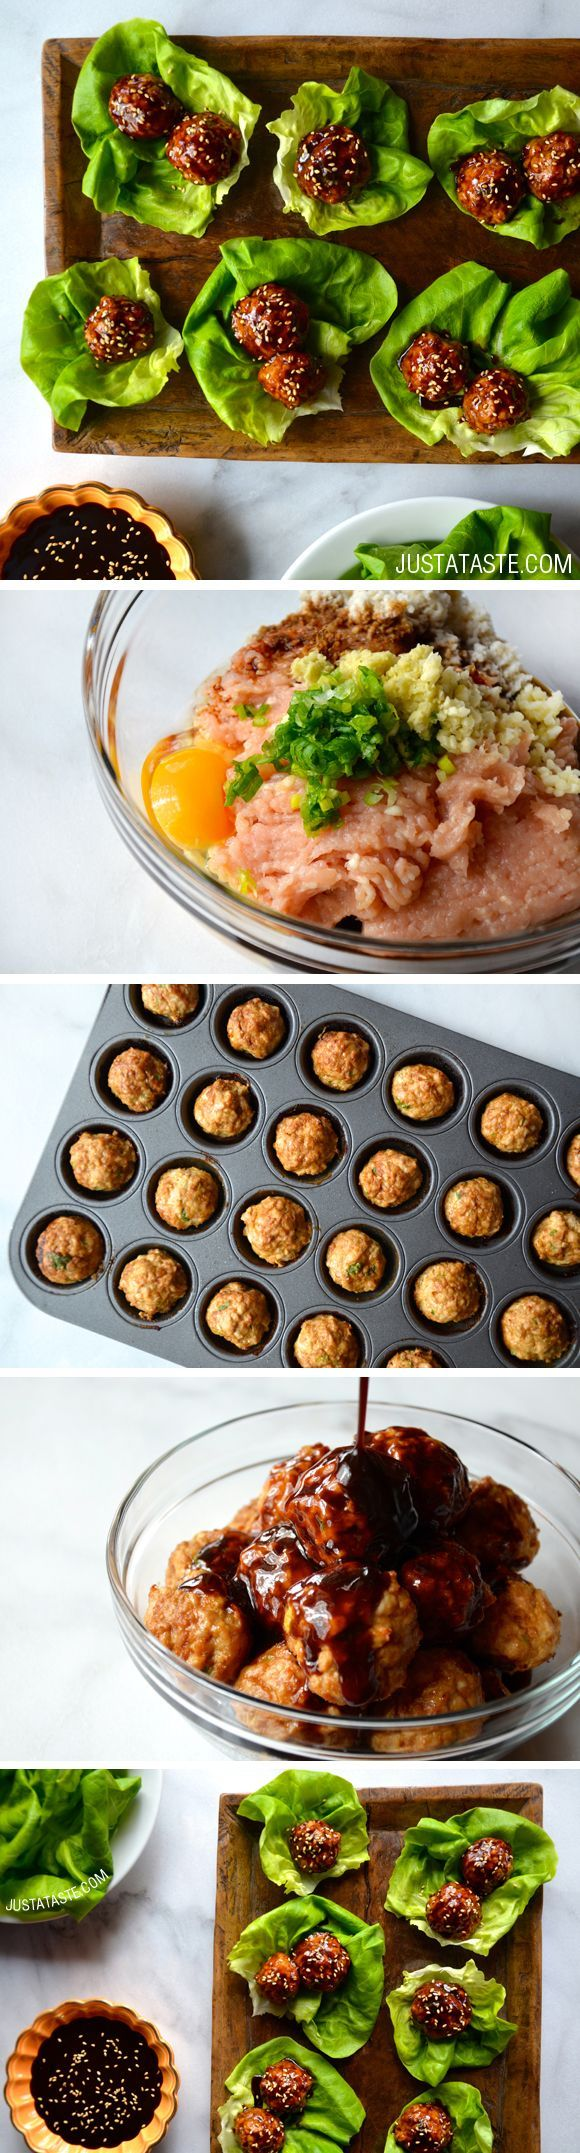 Ground chicken asian lettuce wrap recipe